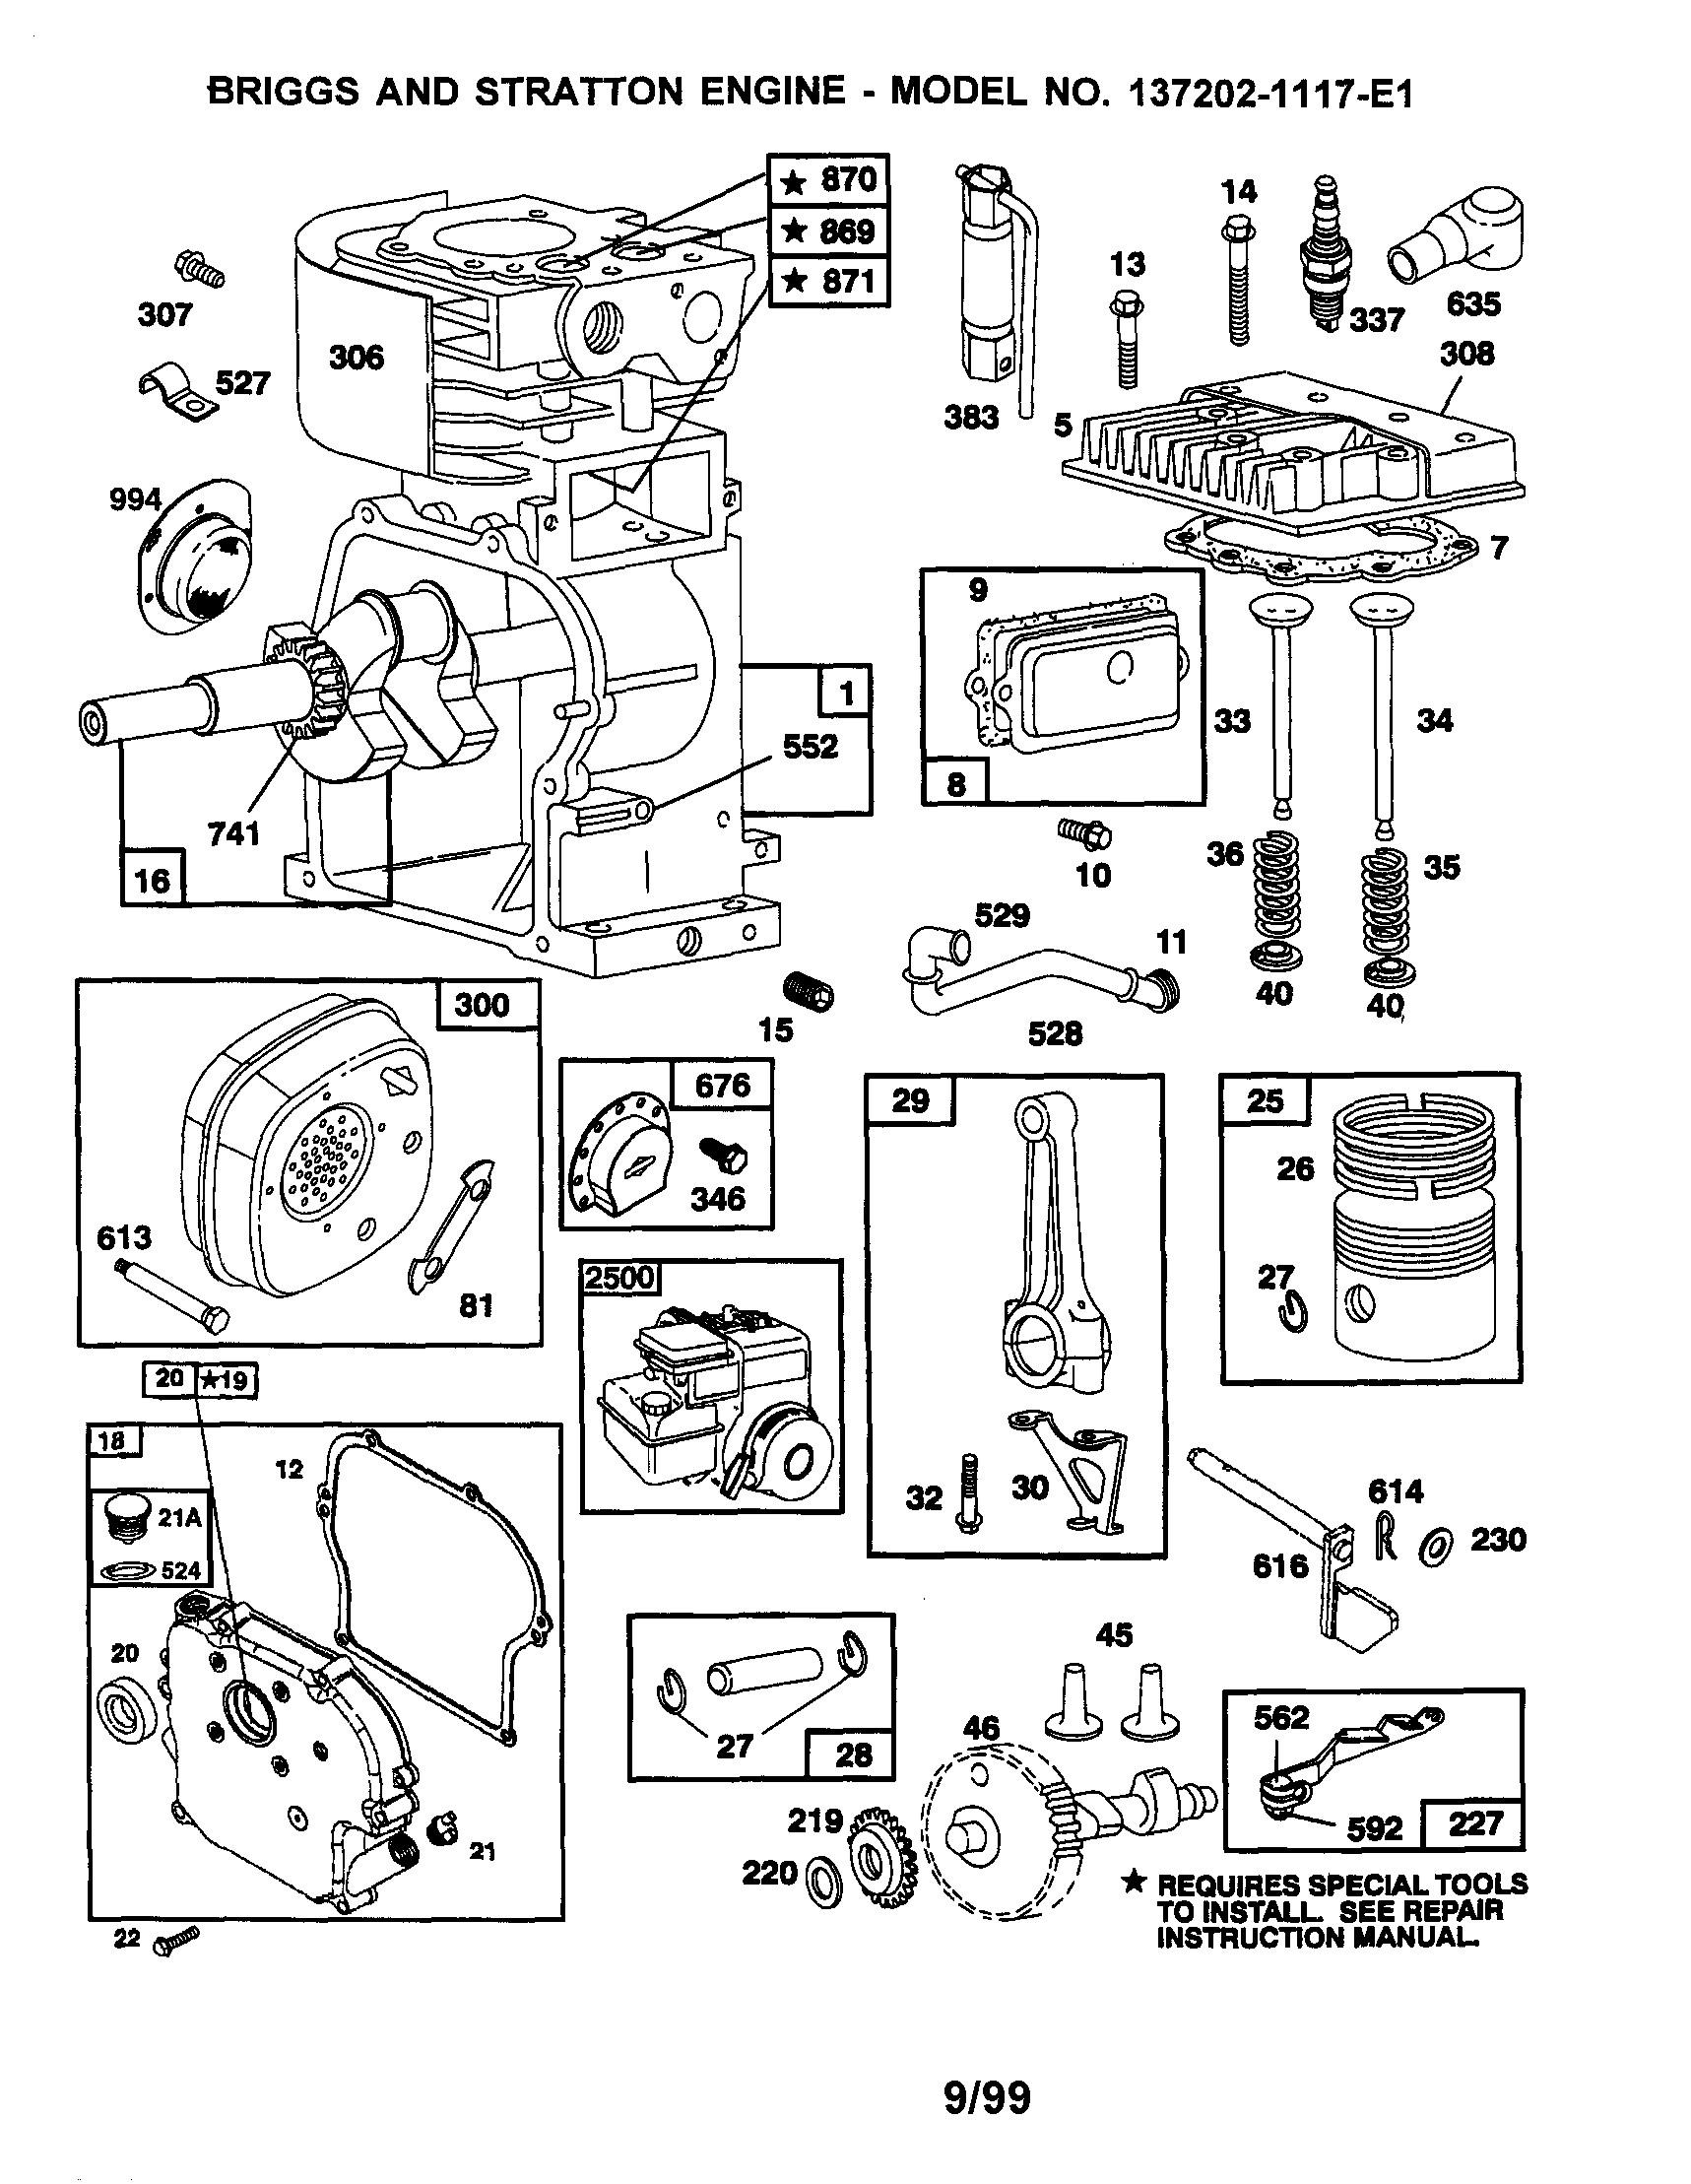 5Hp Briggs And Stratton Carburetor Diagram Briggs And Stratton 4 5 Hp Engine Diagram Wiring Diagram Section